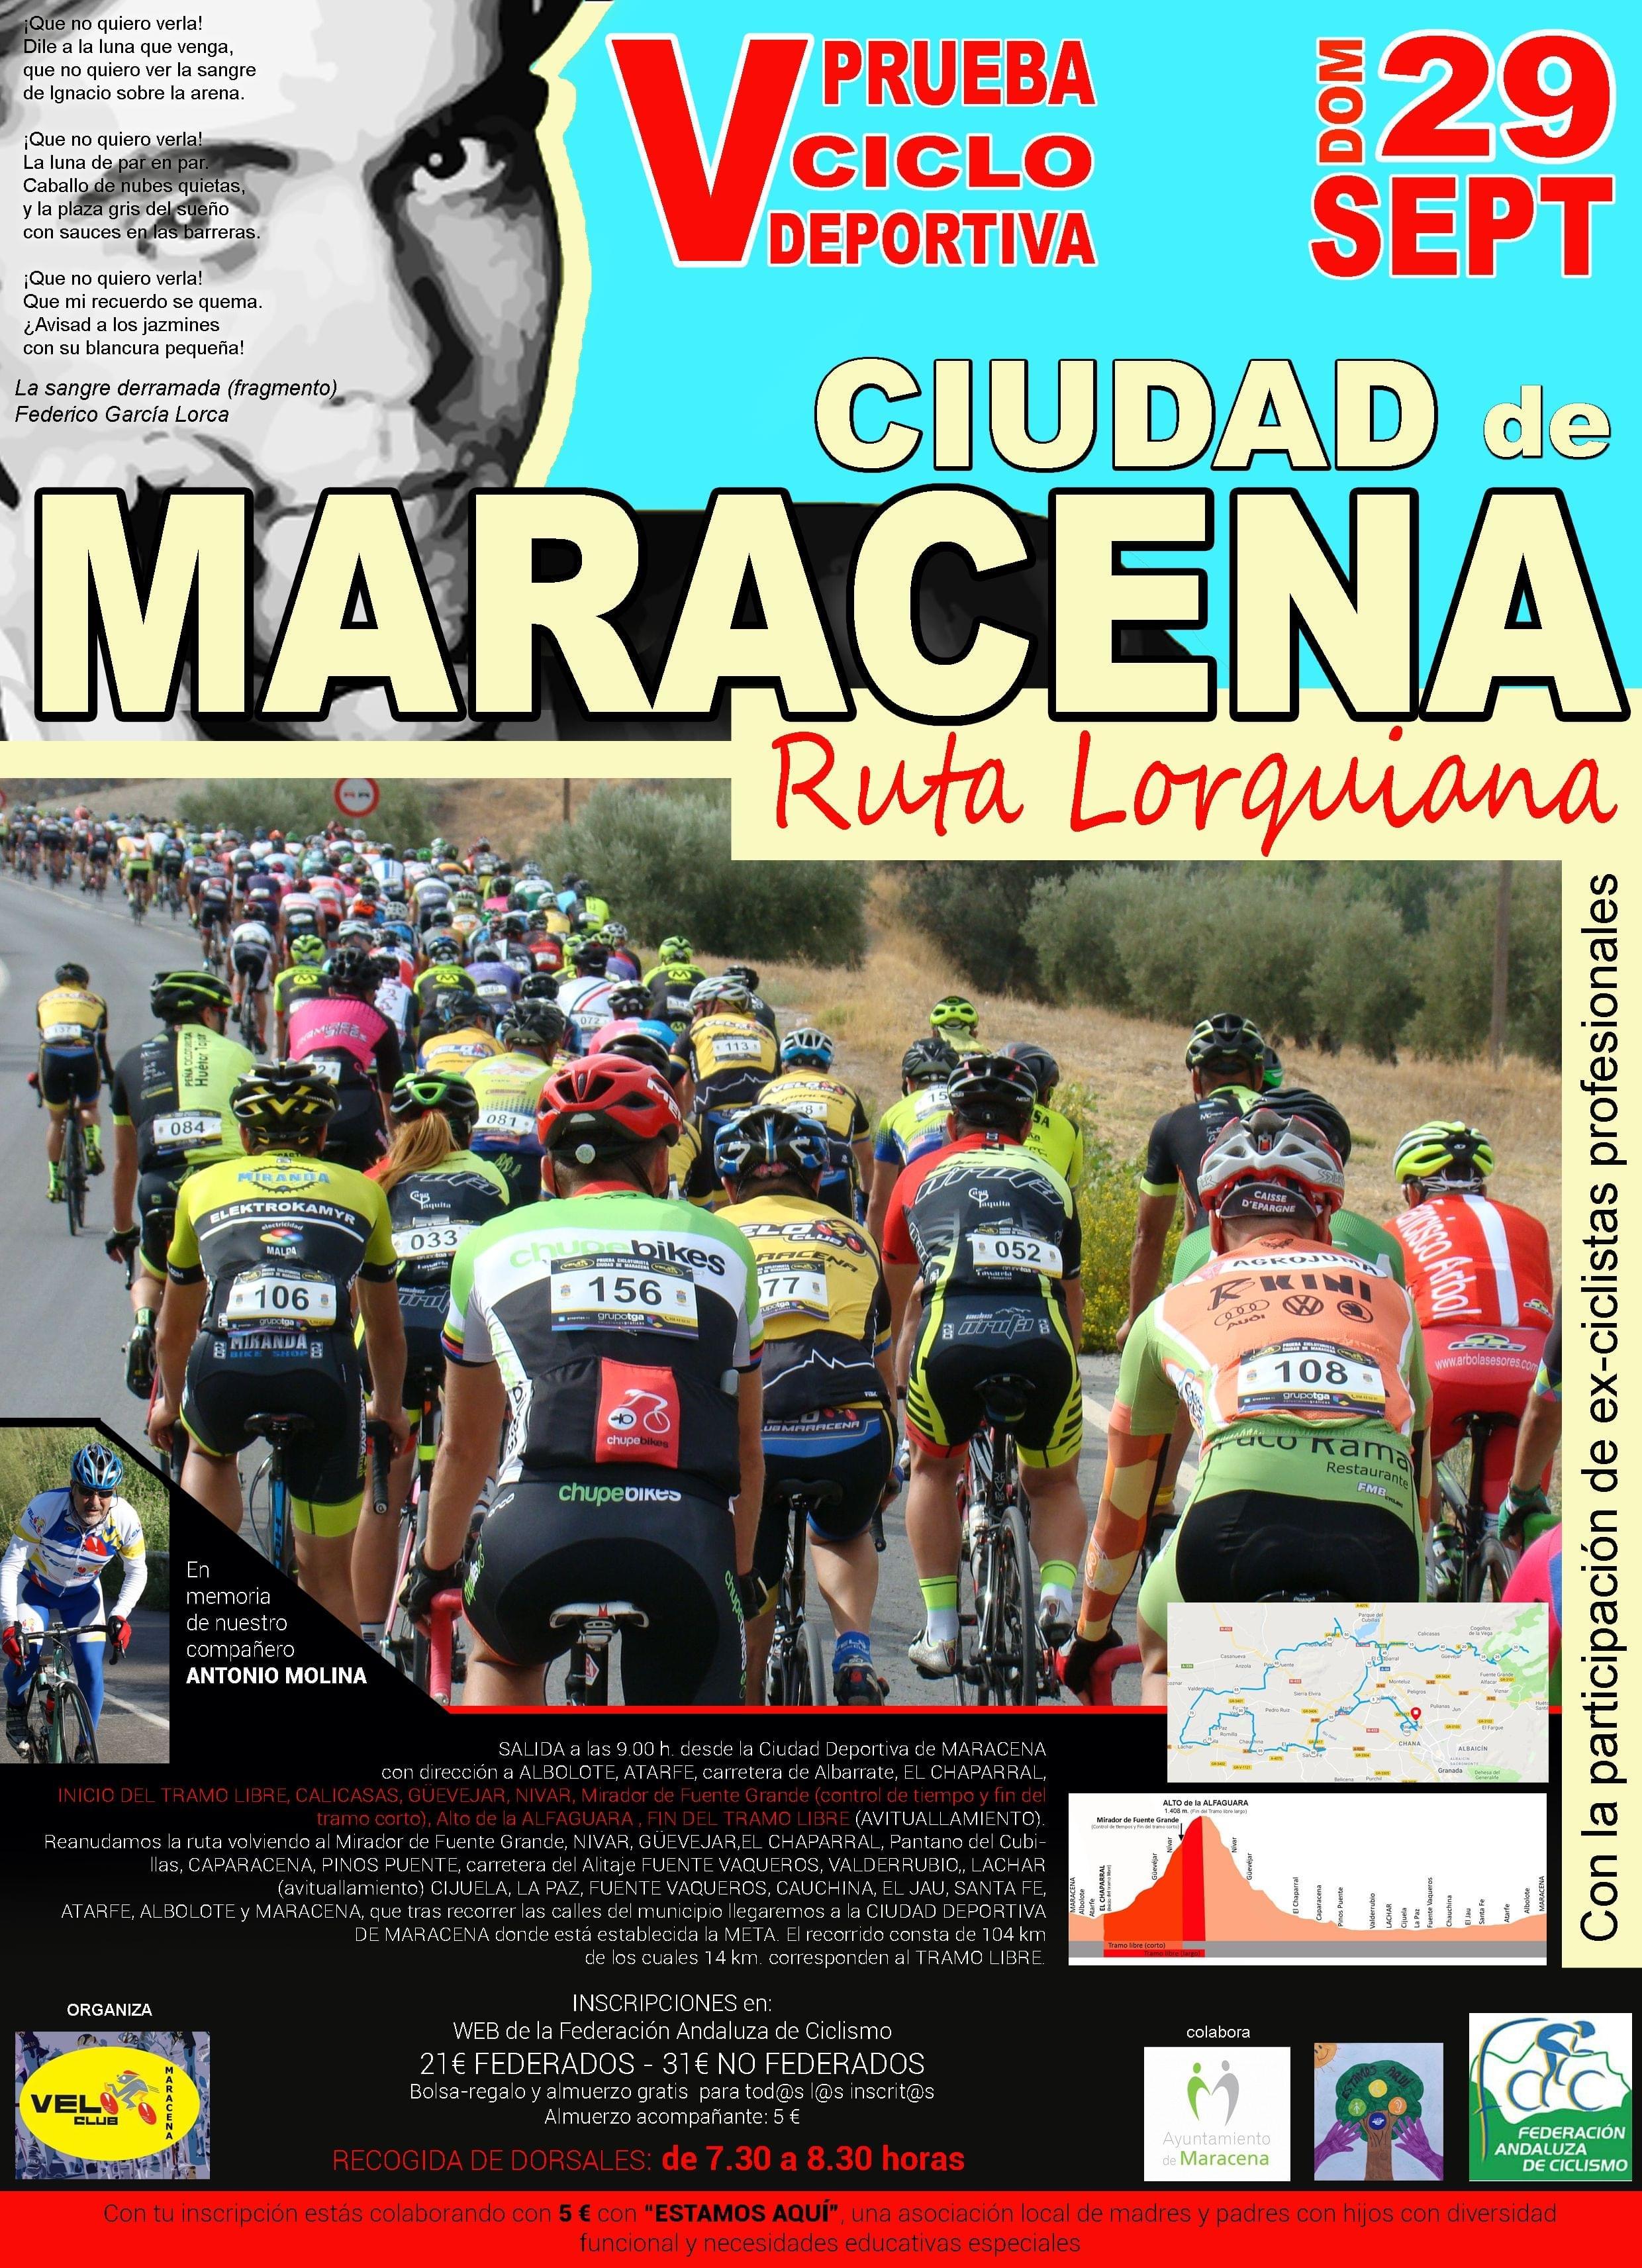 Cartel Ciclodeportiva Ciudad de Maracena.